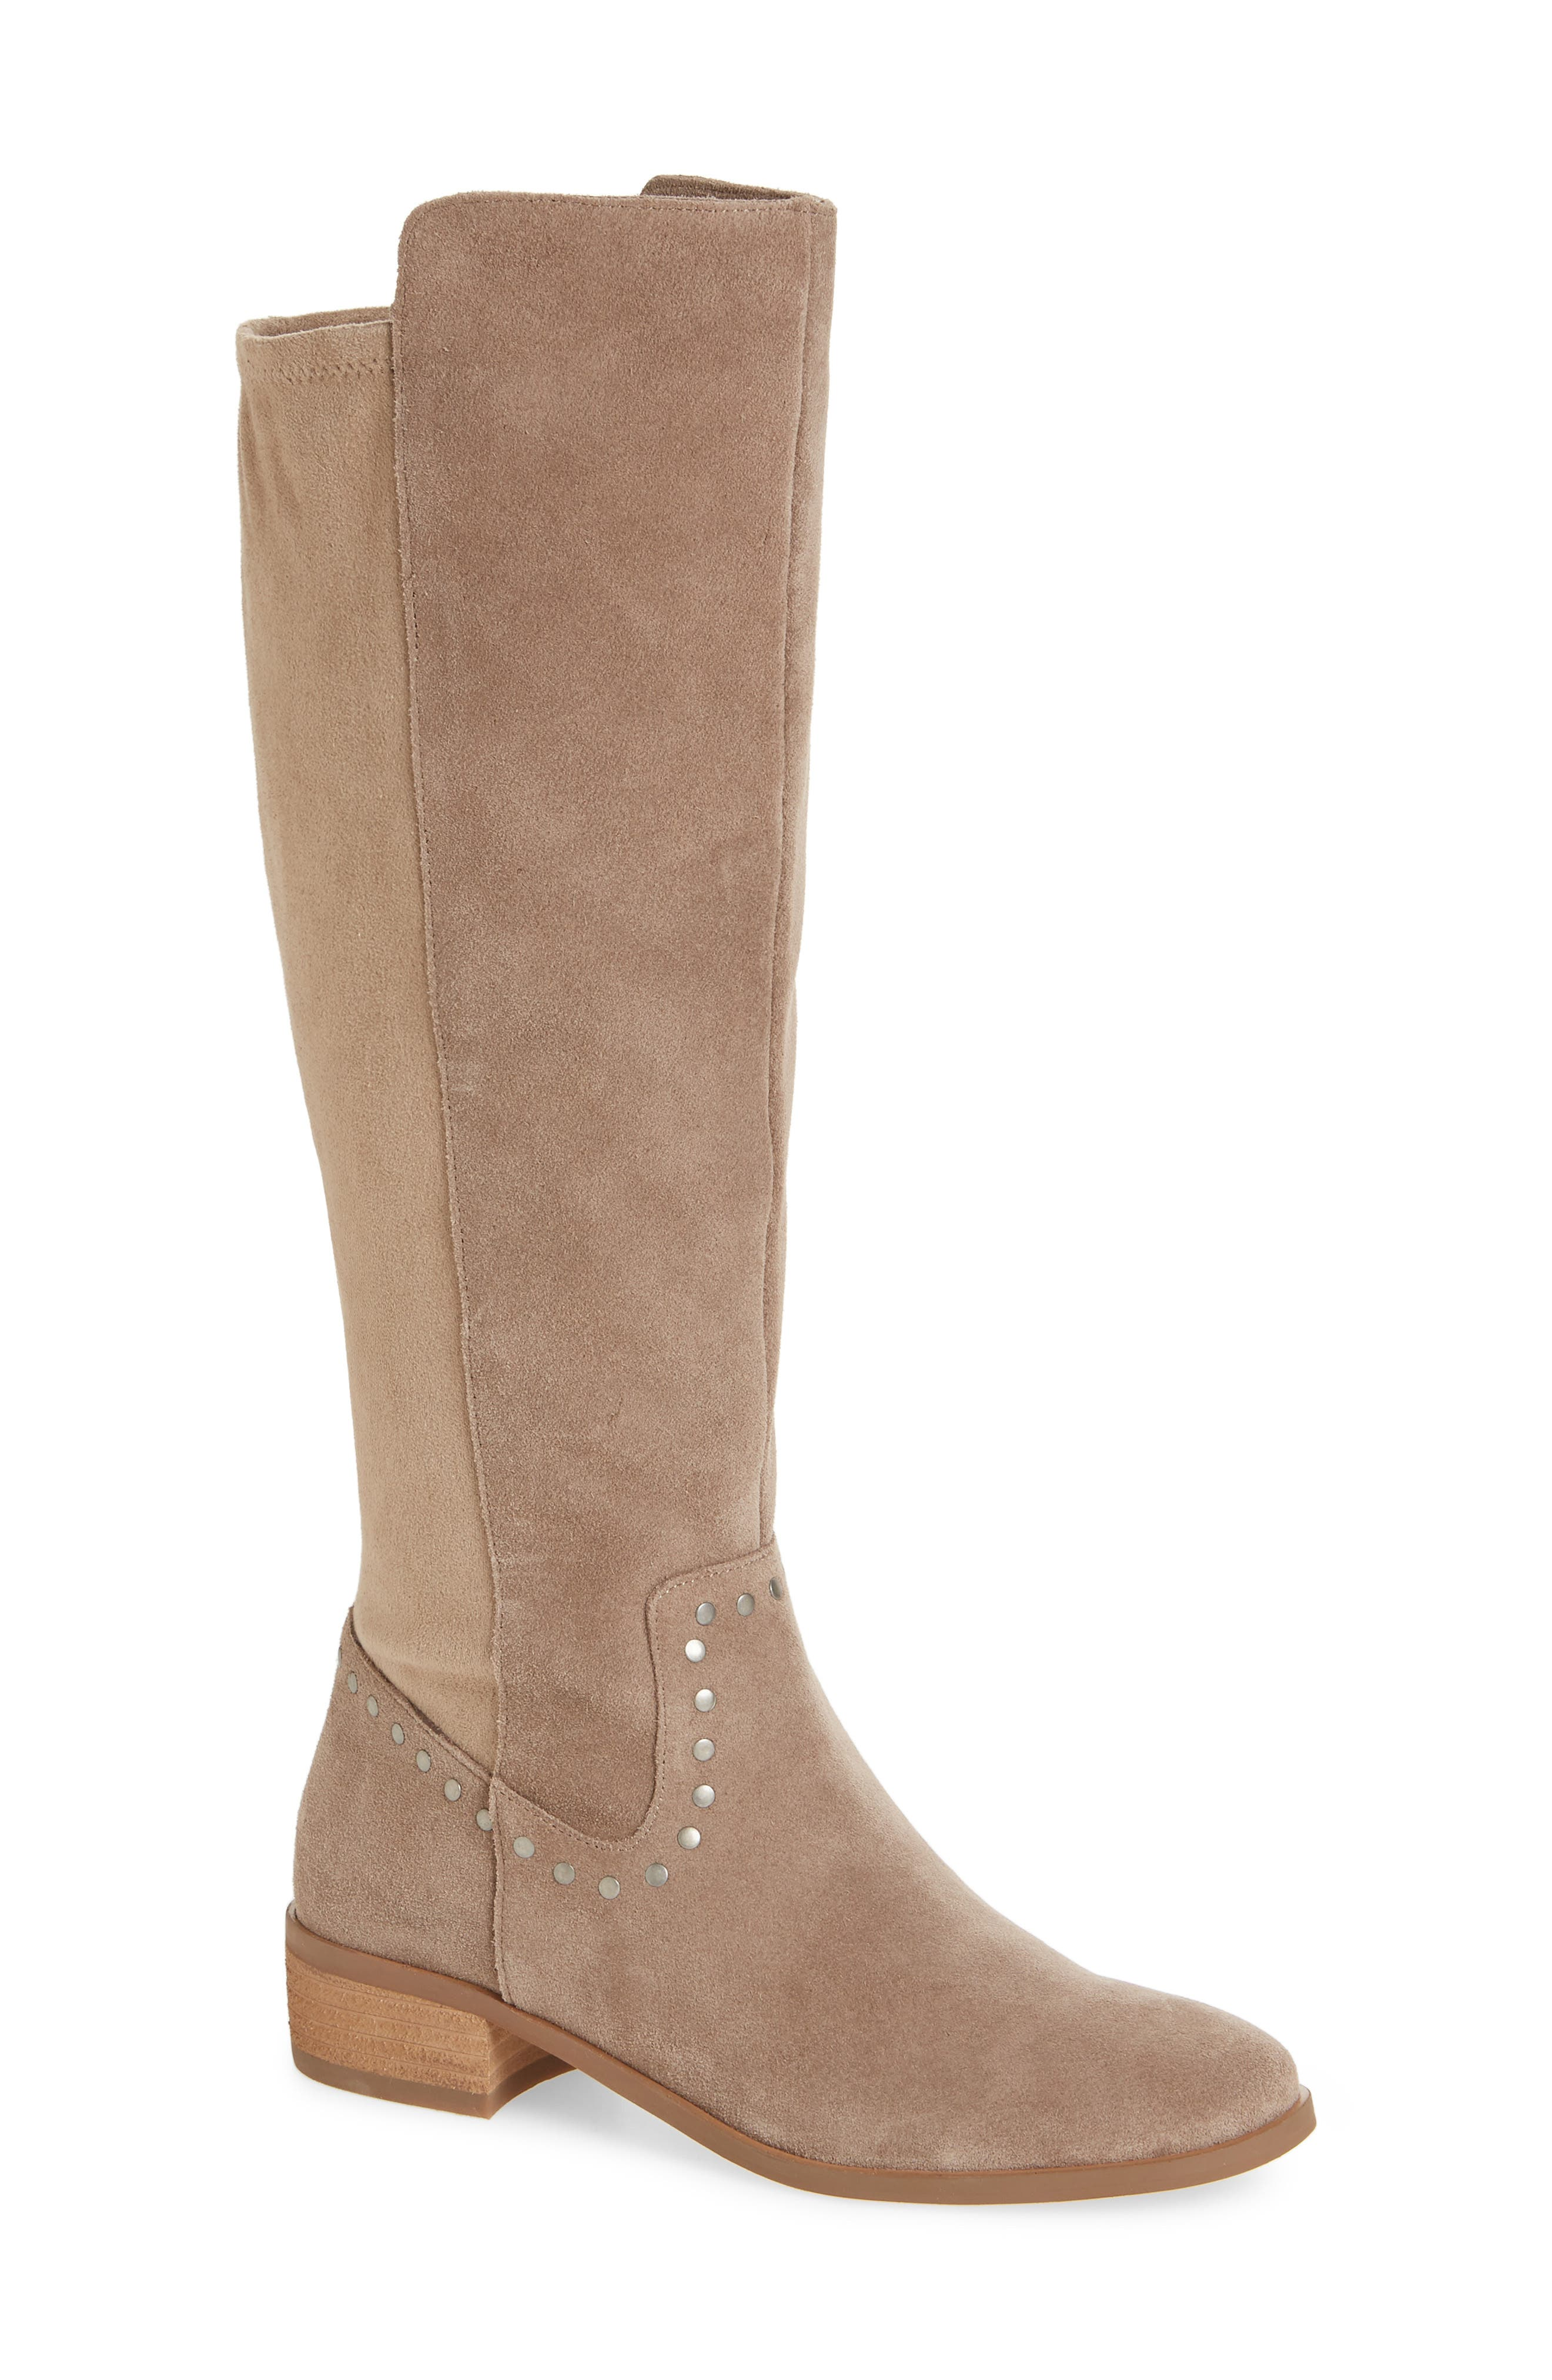 Calvenia Knee High Boot,                         Main,                         color, FALL TAUPE SUEDE